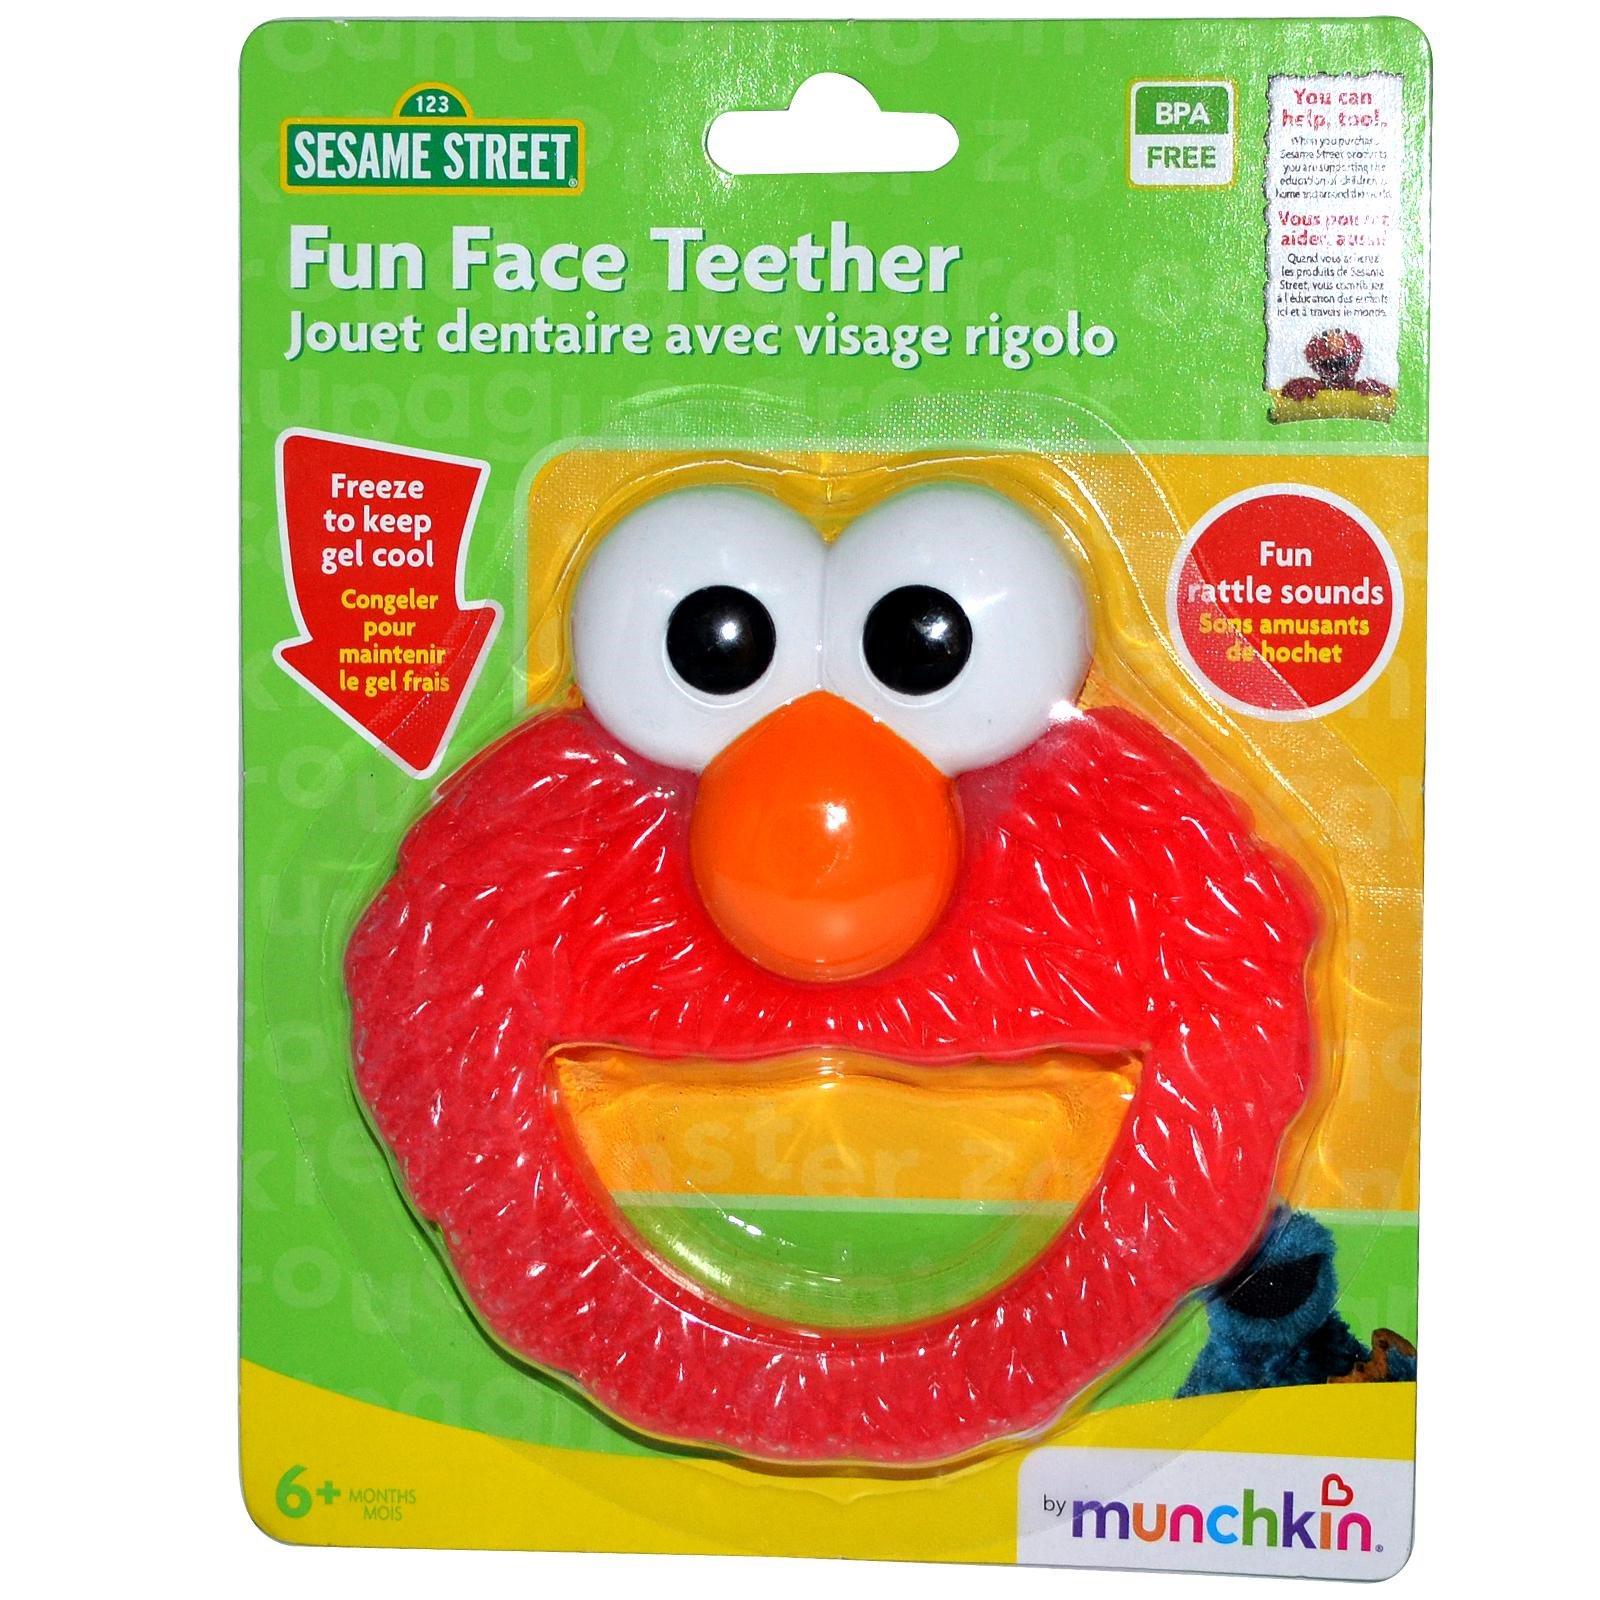 Munchkin Sesame Street Fun Face Teether iHerb